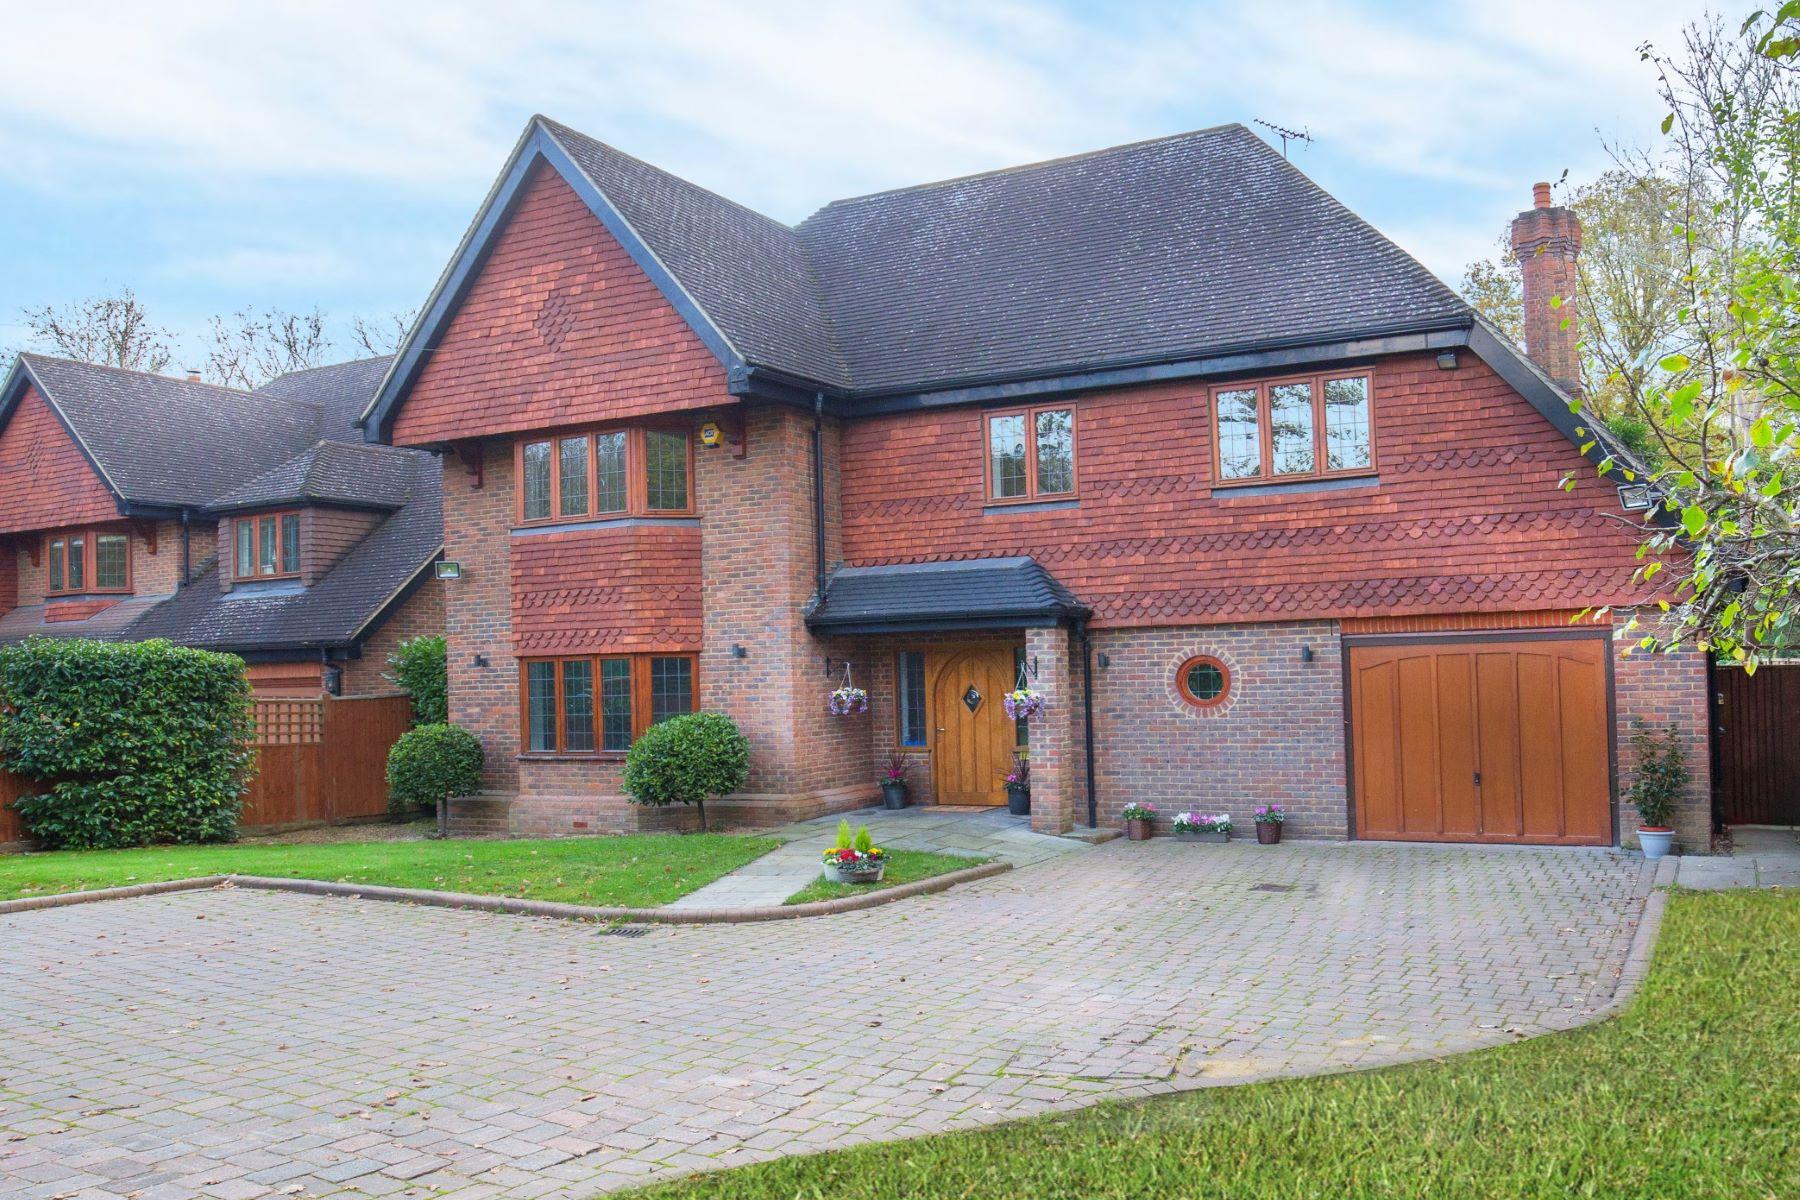 Single Family Homes for Sale at Leatherhead Road, Oxshott, Surrey, KT22 Oxford House Leatherhead Road Oxshott, England KT22 0ET United Kingdom